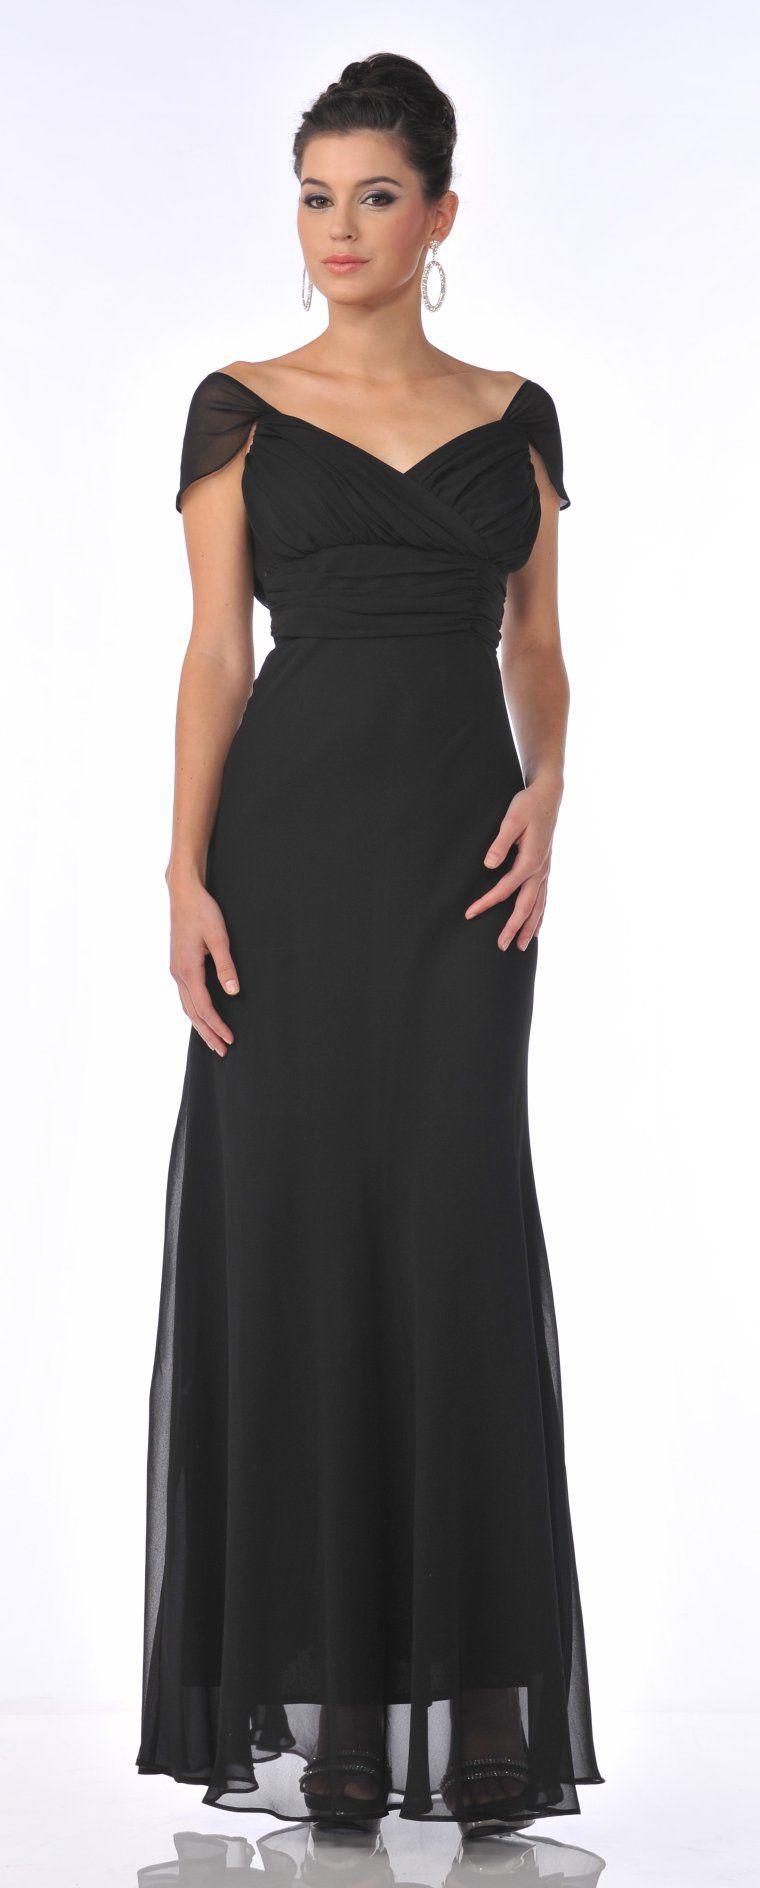 6e80189a3ca1 Off The Shoulder Cap Sleeve Black Chiffon Long Semi Formal Dress  96.99